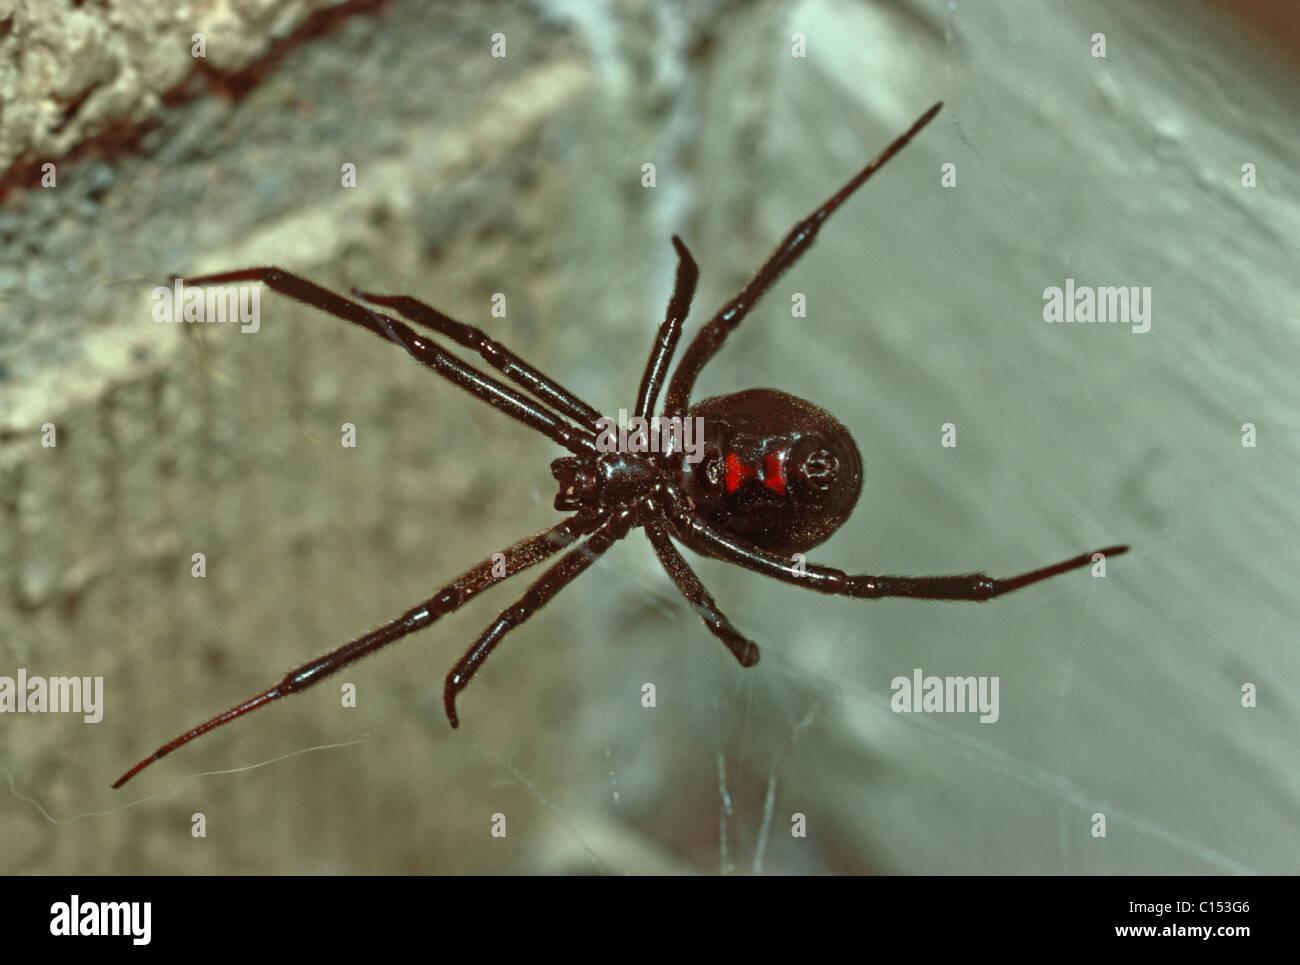 Black Widow spider (Latrodectus mactans) on web near front door of home Colorado US. & Black Widow spider (Latrodectus mactans) on web near front door of ... Pezcame.Com